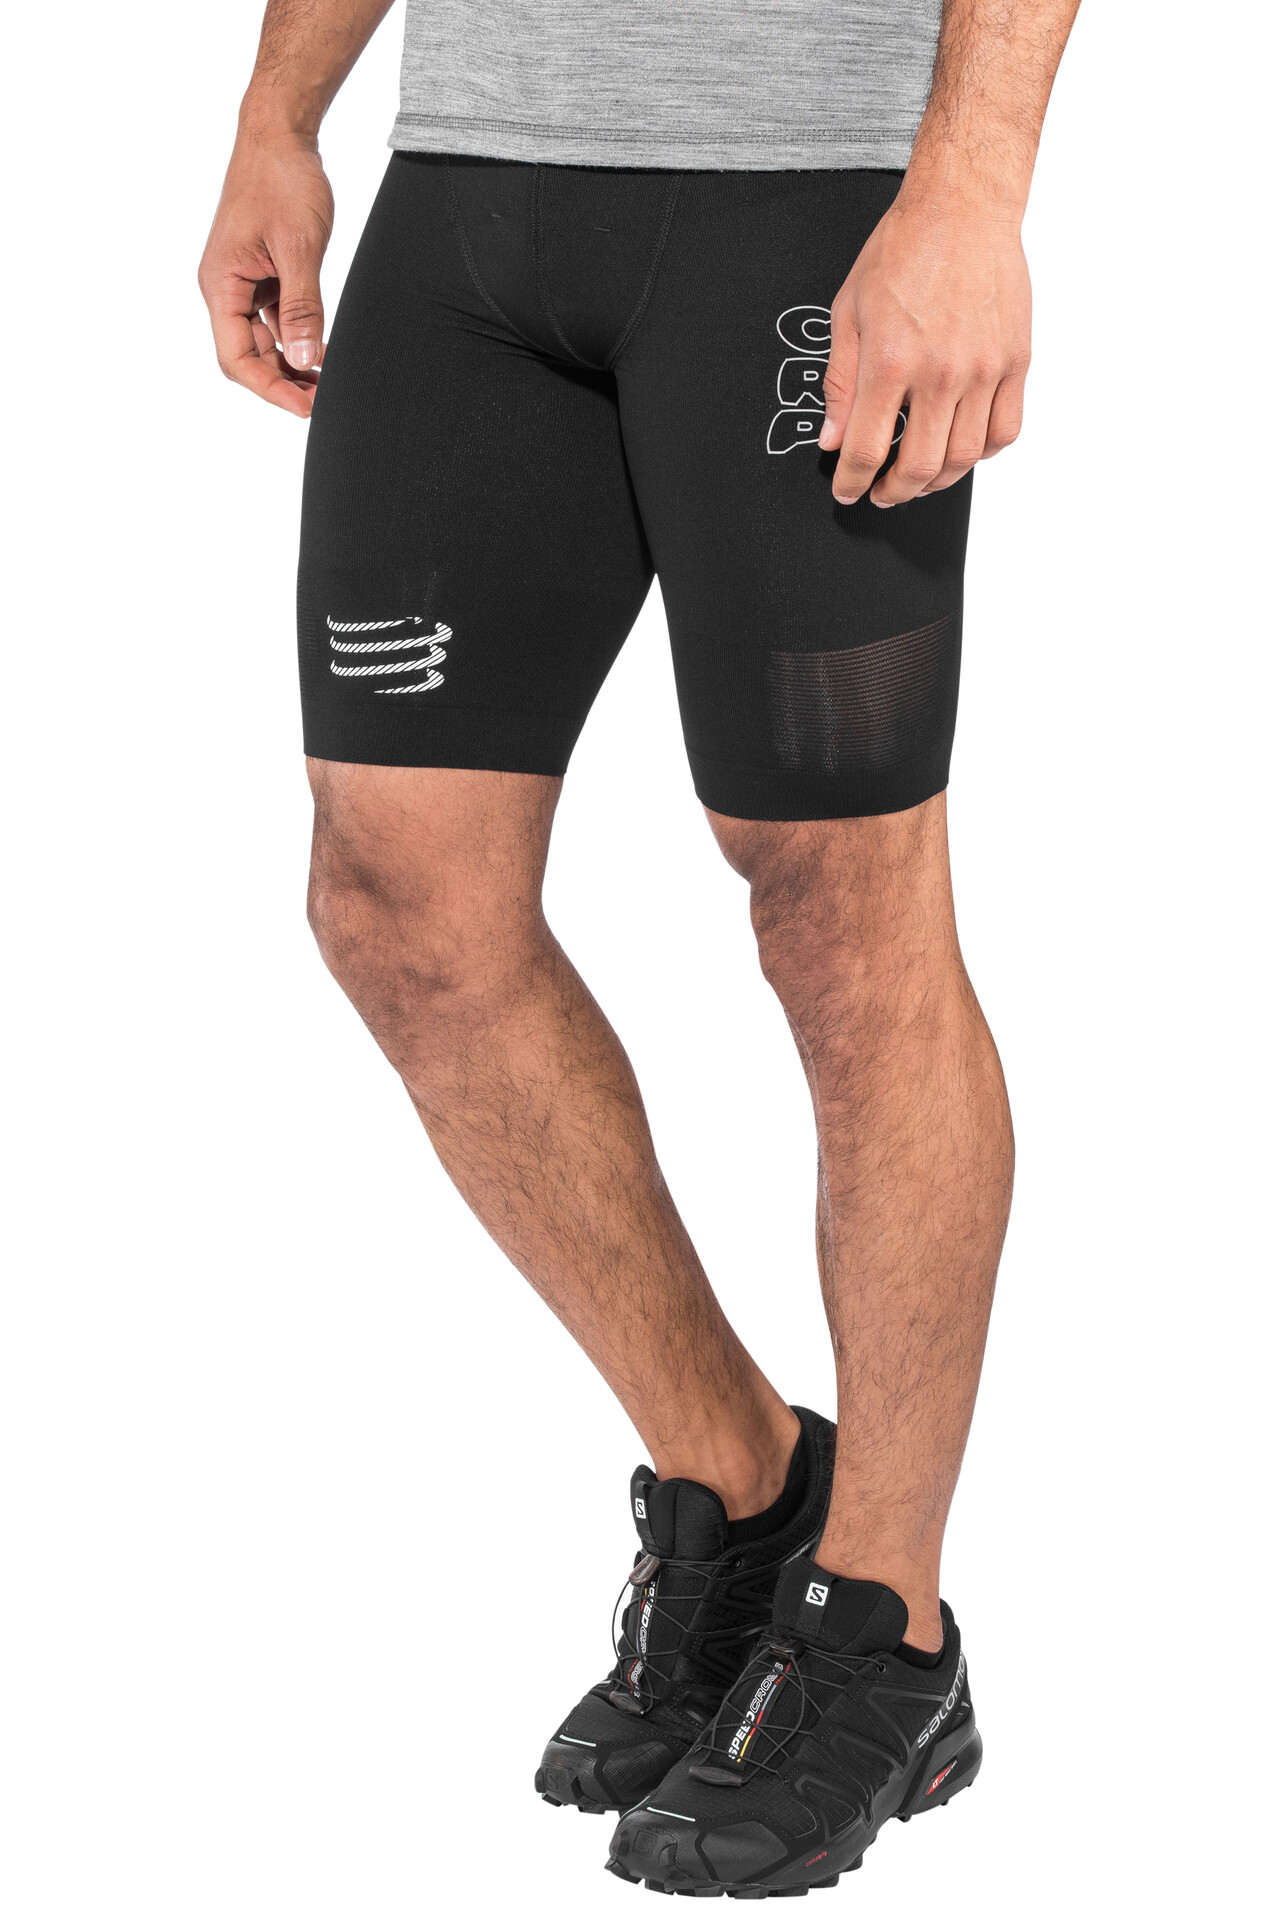 COMPRESSPORT Under Control Pantaloncini da Corsa a Compressione